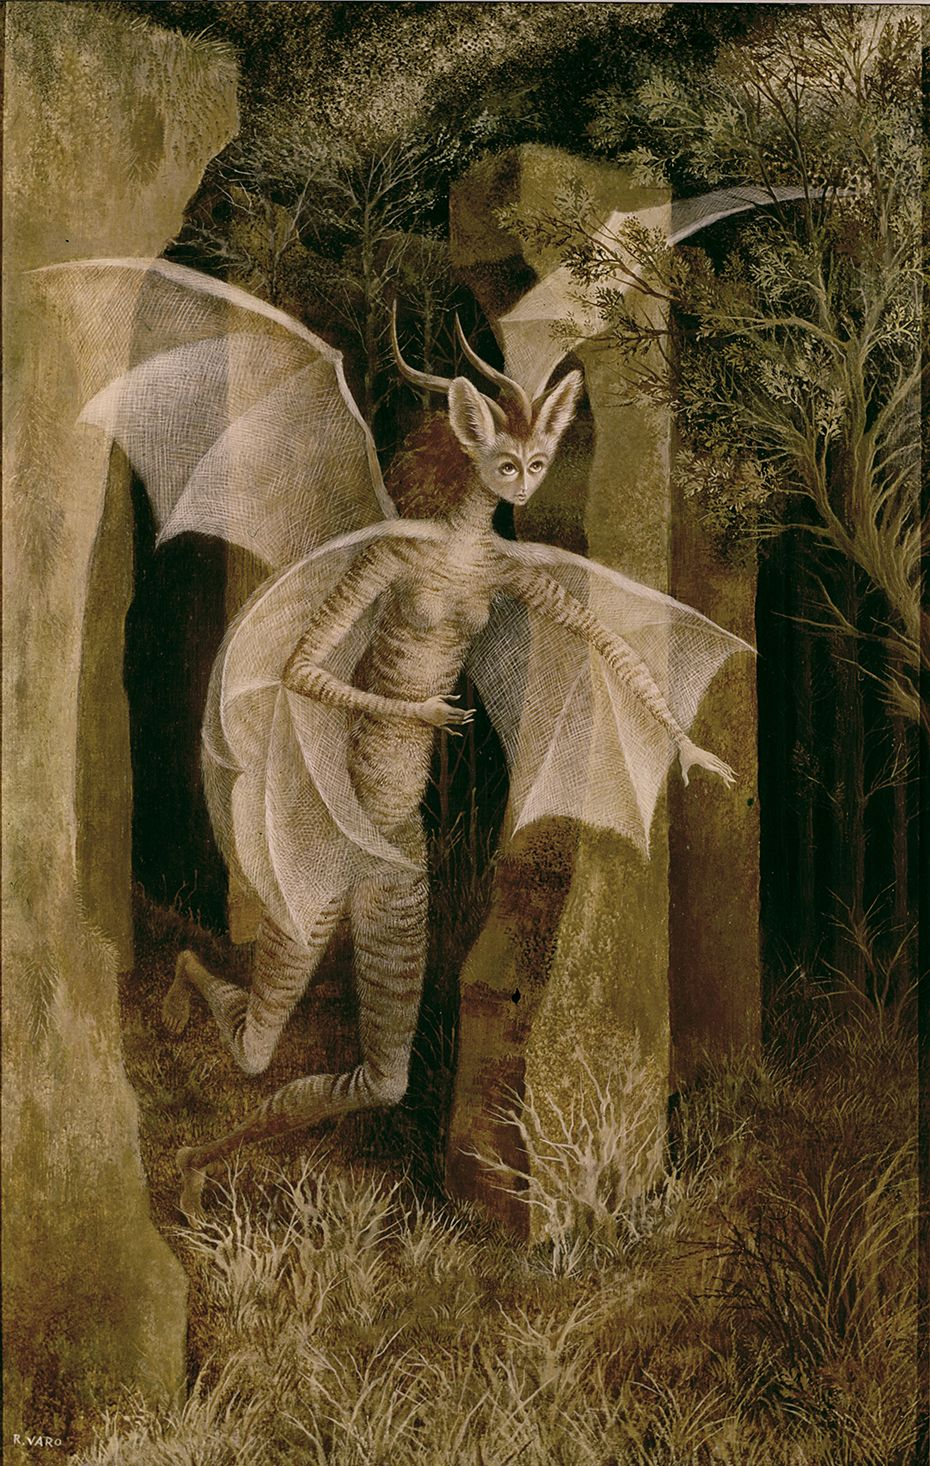 Personaje, 1958. – Remedios Varo